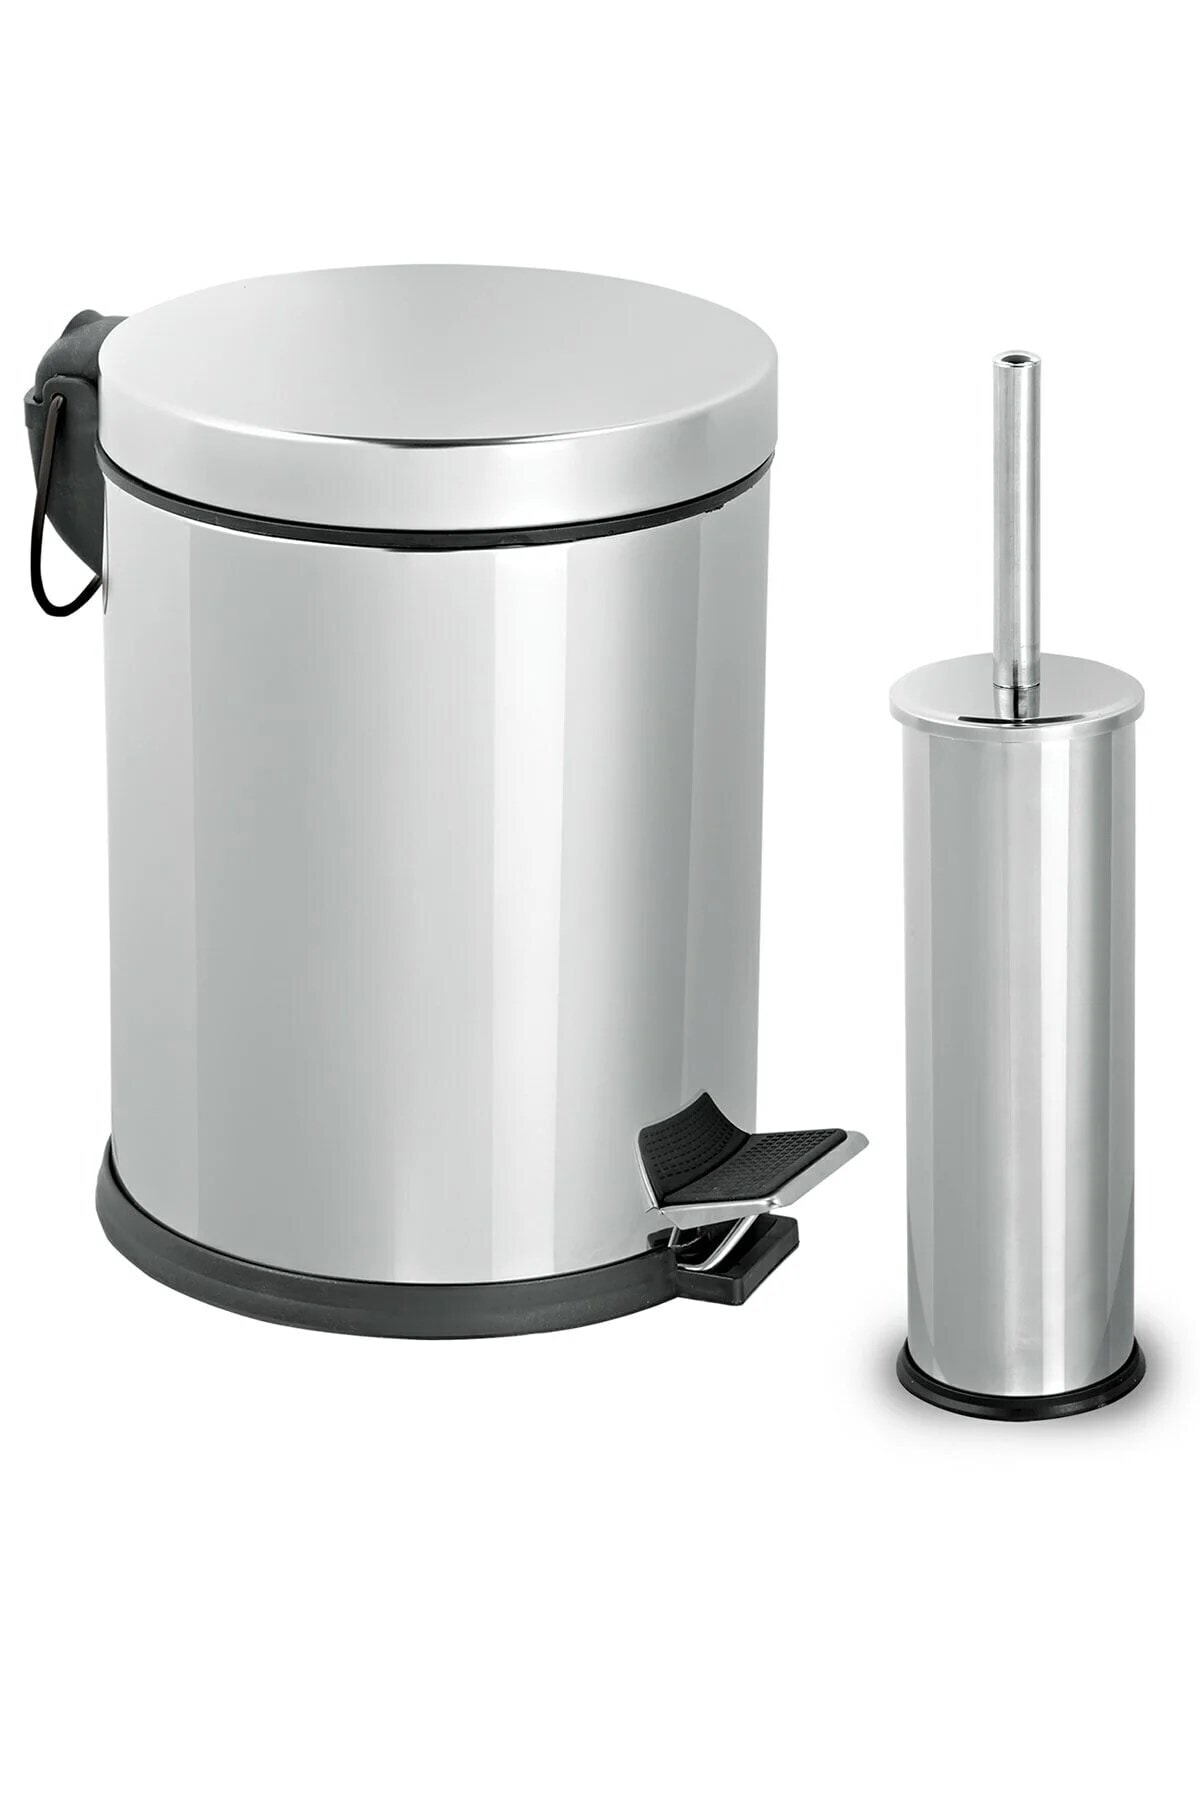 3lt Krom 2'li Banyo Seti Pedallı Çöp Kovası Wc Klozet Tuvalet Fırça Seti Banyo Çöp Kovası